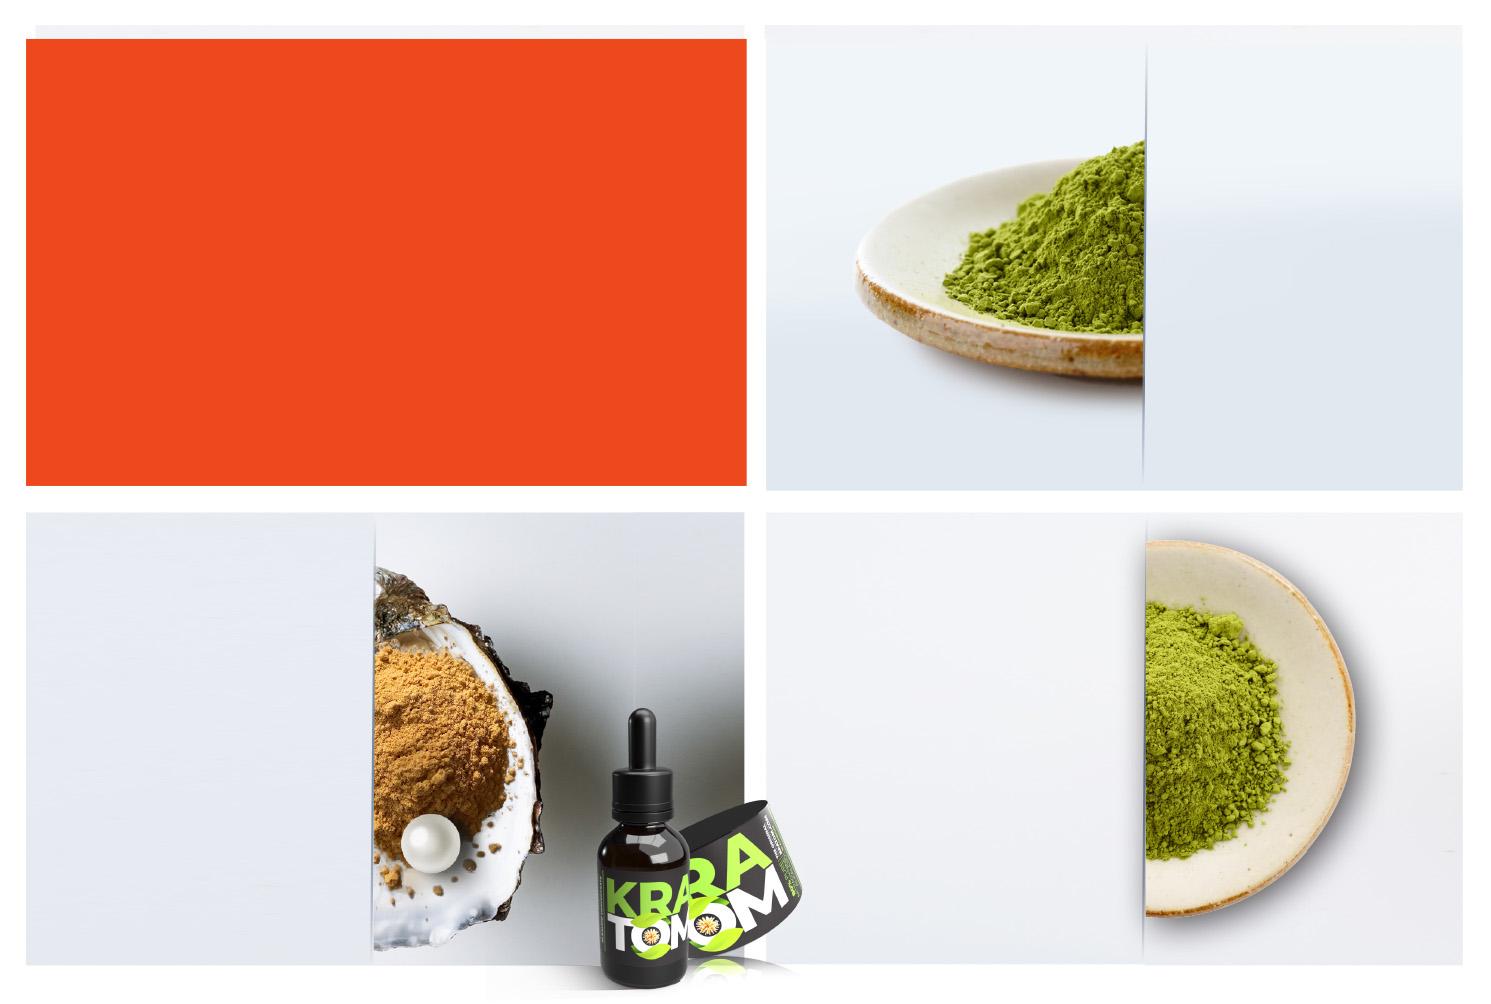 kratom extracts, kratom capsules, kratom tablets, kratom powder